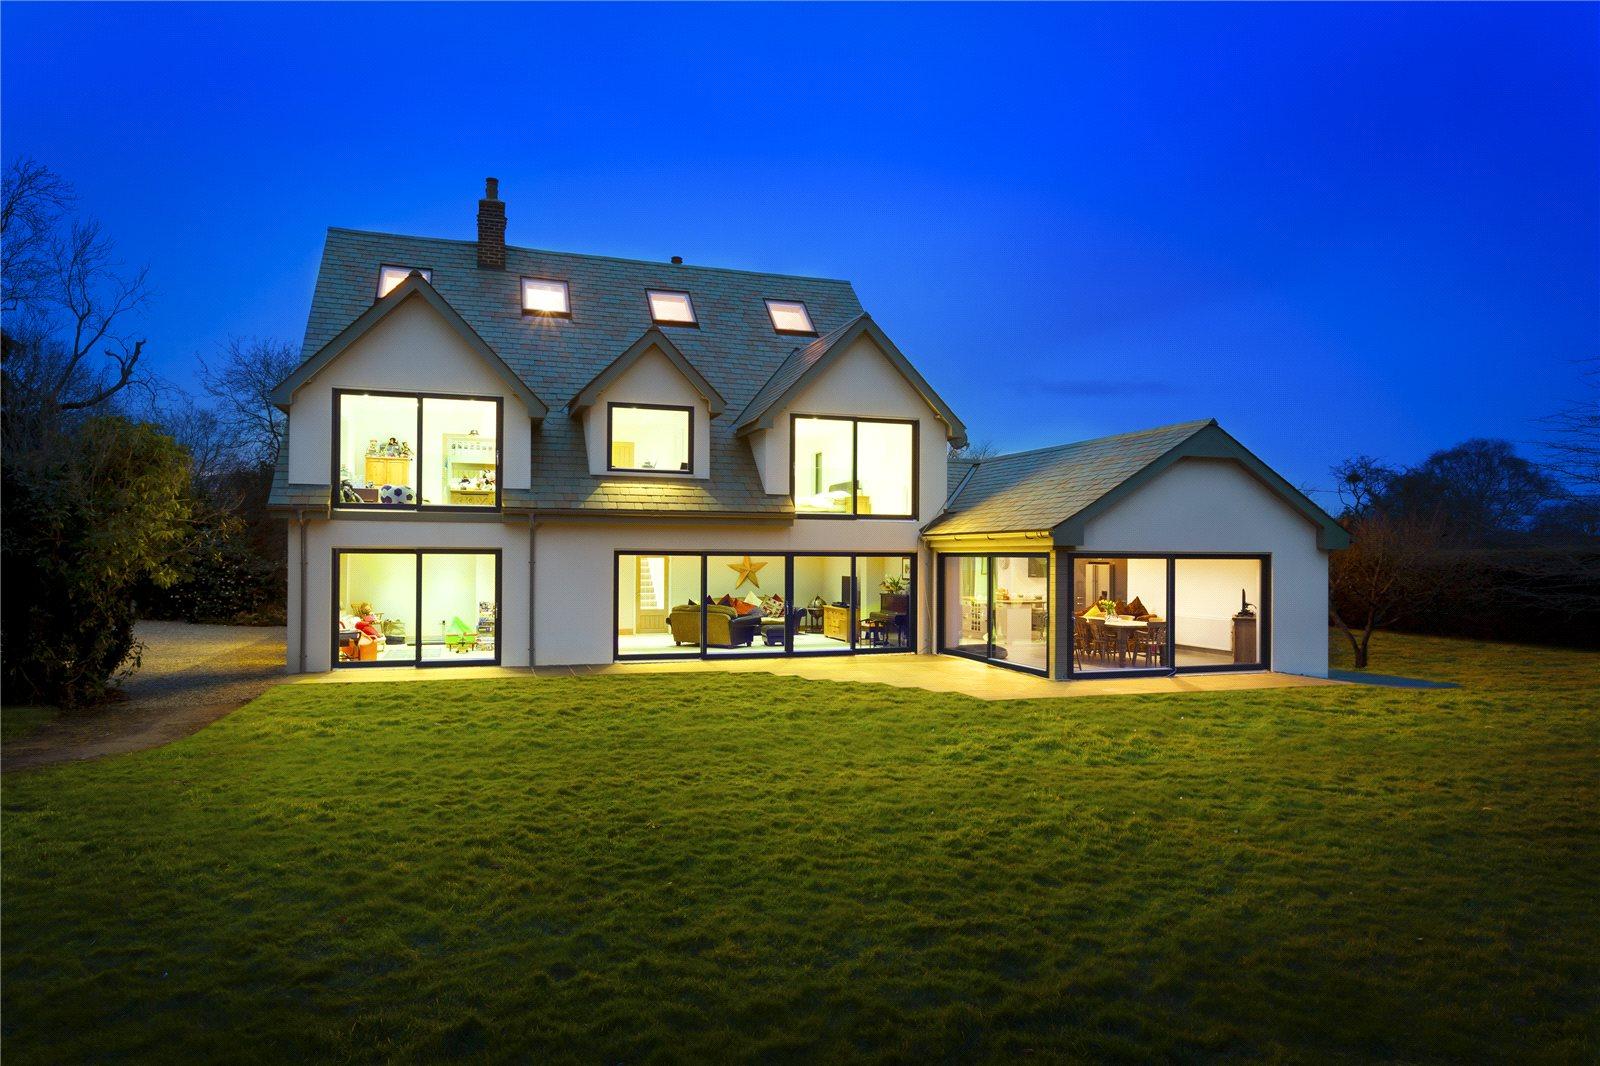 Maison unifamiliale pour l Vente à Canterbury Road, Challock, Ashford, Kent, TN25 Ashford, Angleterre